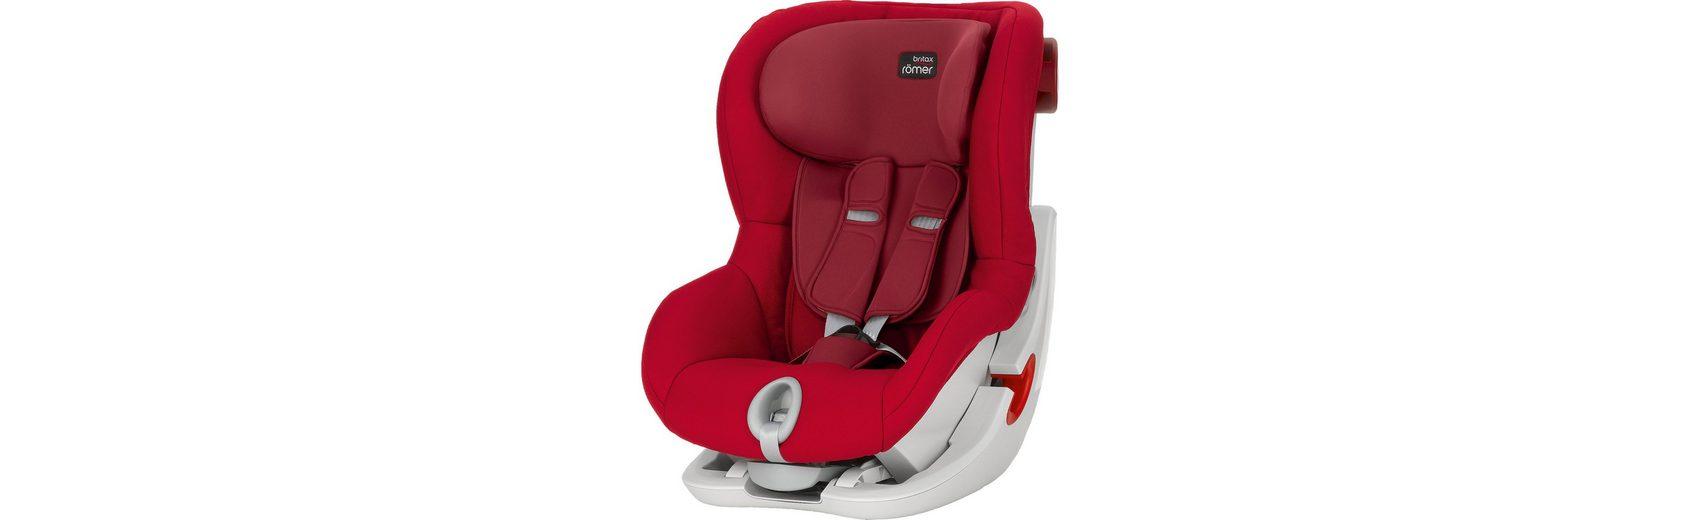 Britax Römer Auto-Kindersitz King II, Flame Red, 2016